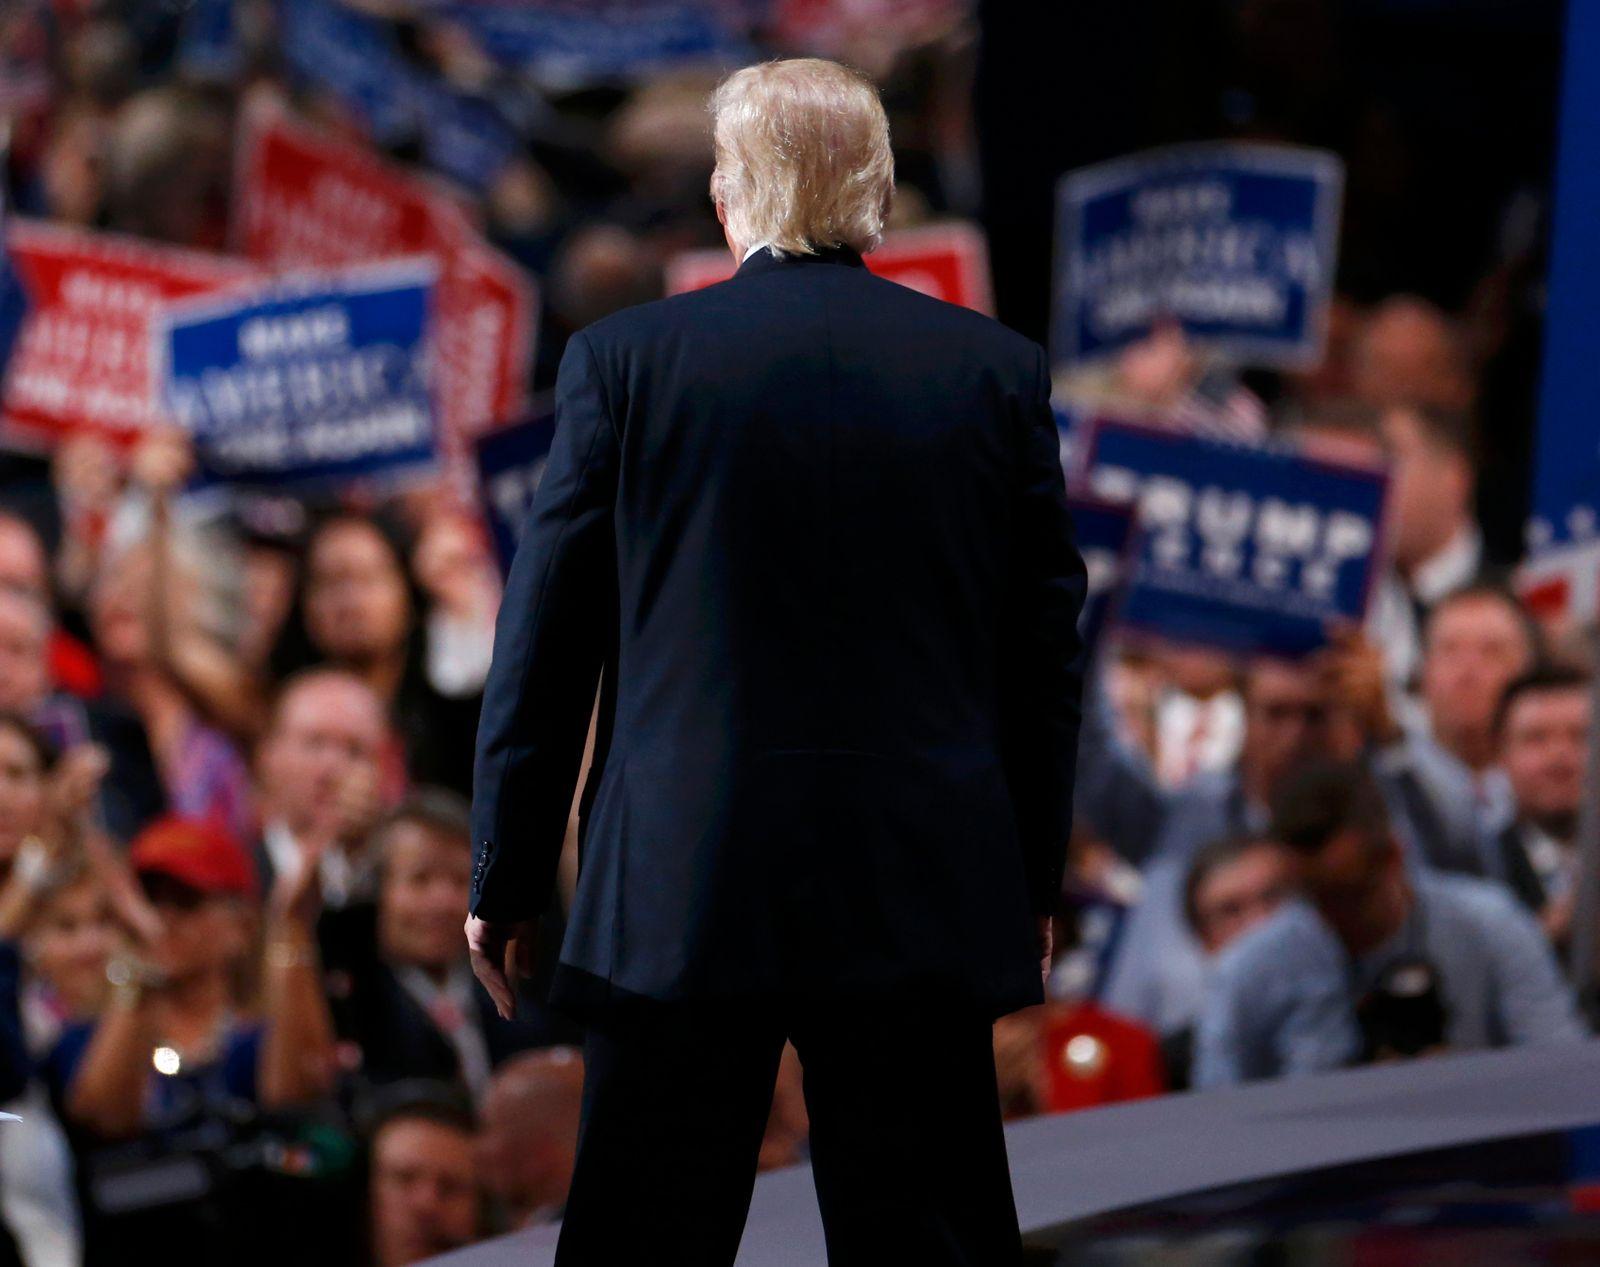 Donald Trump / GOP / Cleveland